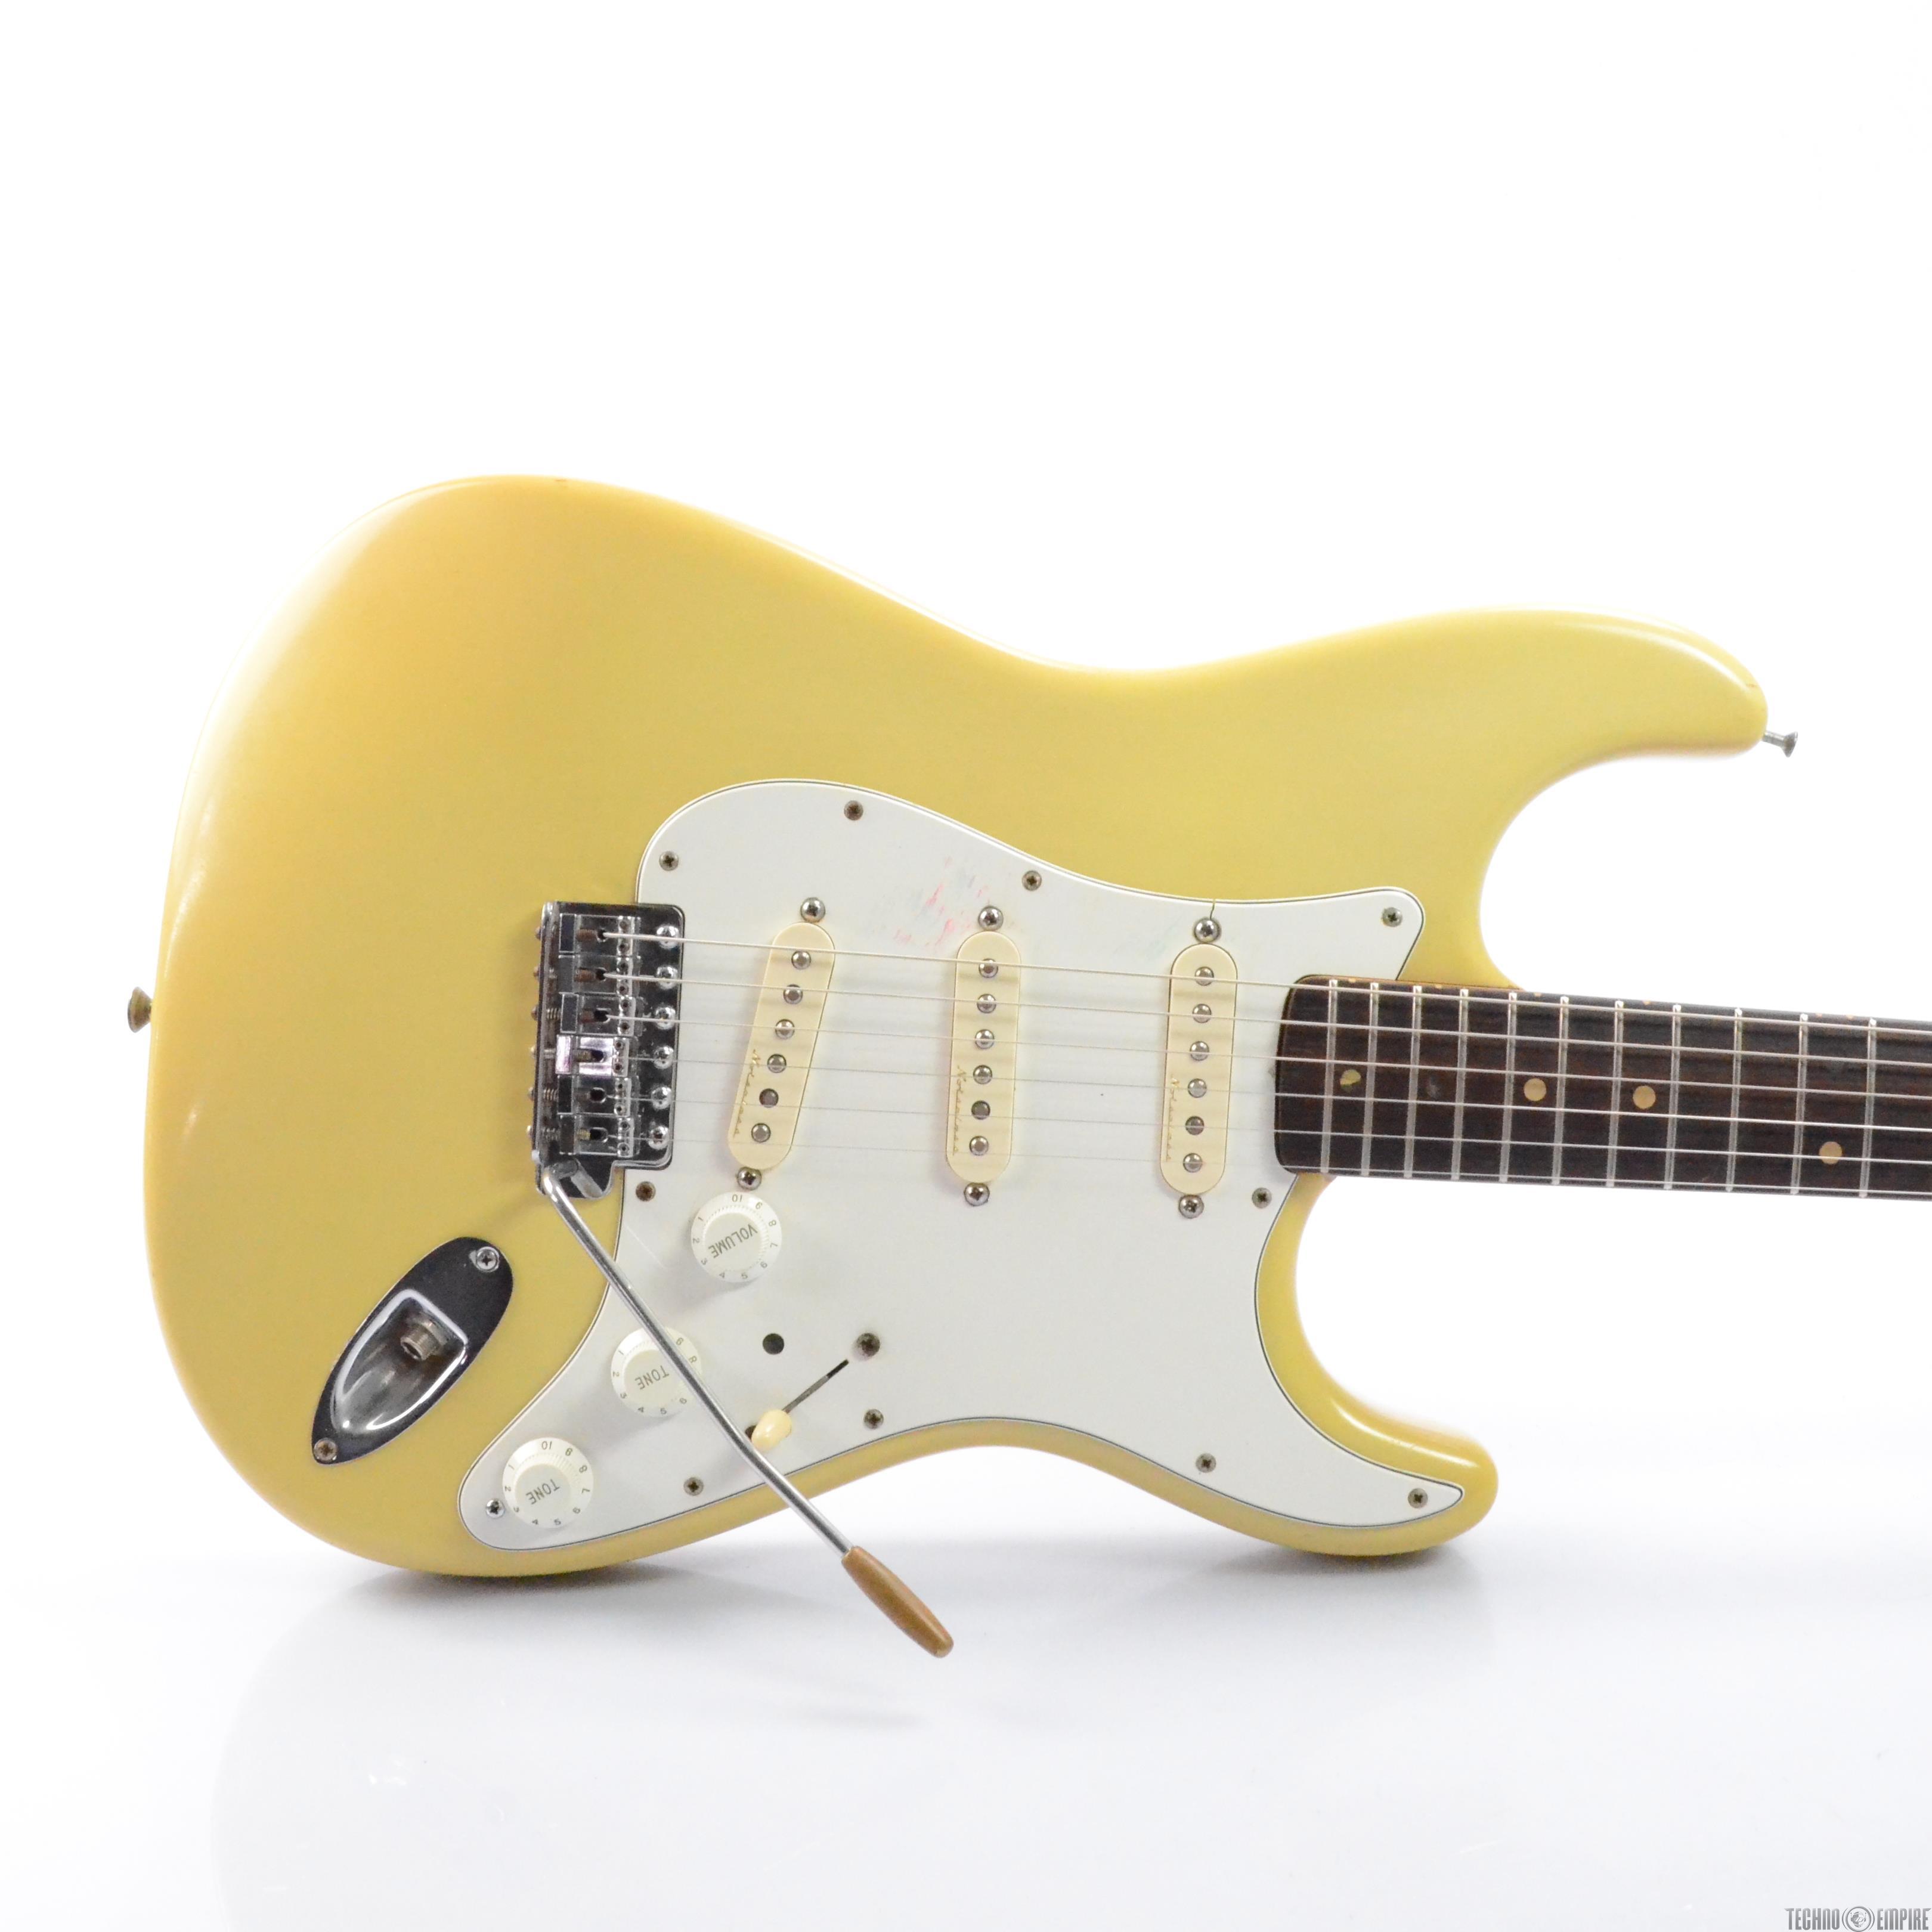 Vintage 1963 Fender Stratocaster Strat Electric Guitar w/ Case Pre CBS #27932